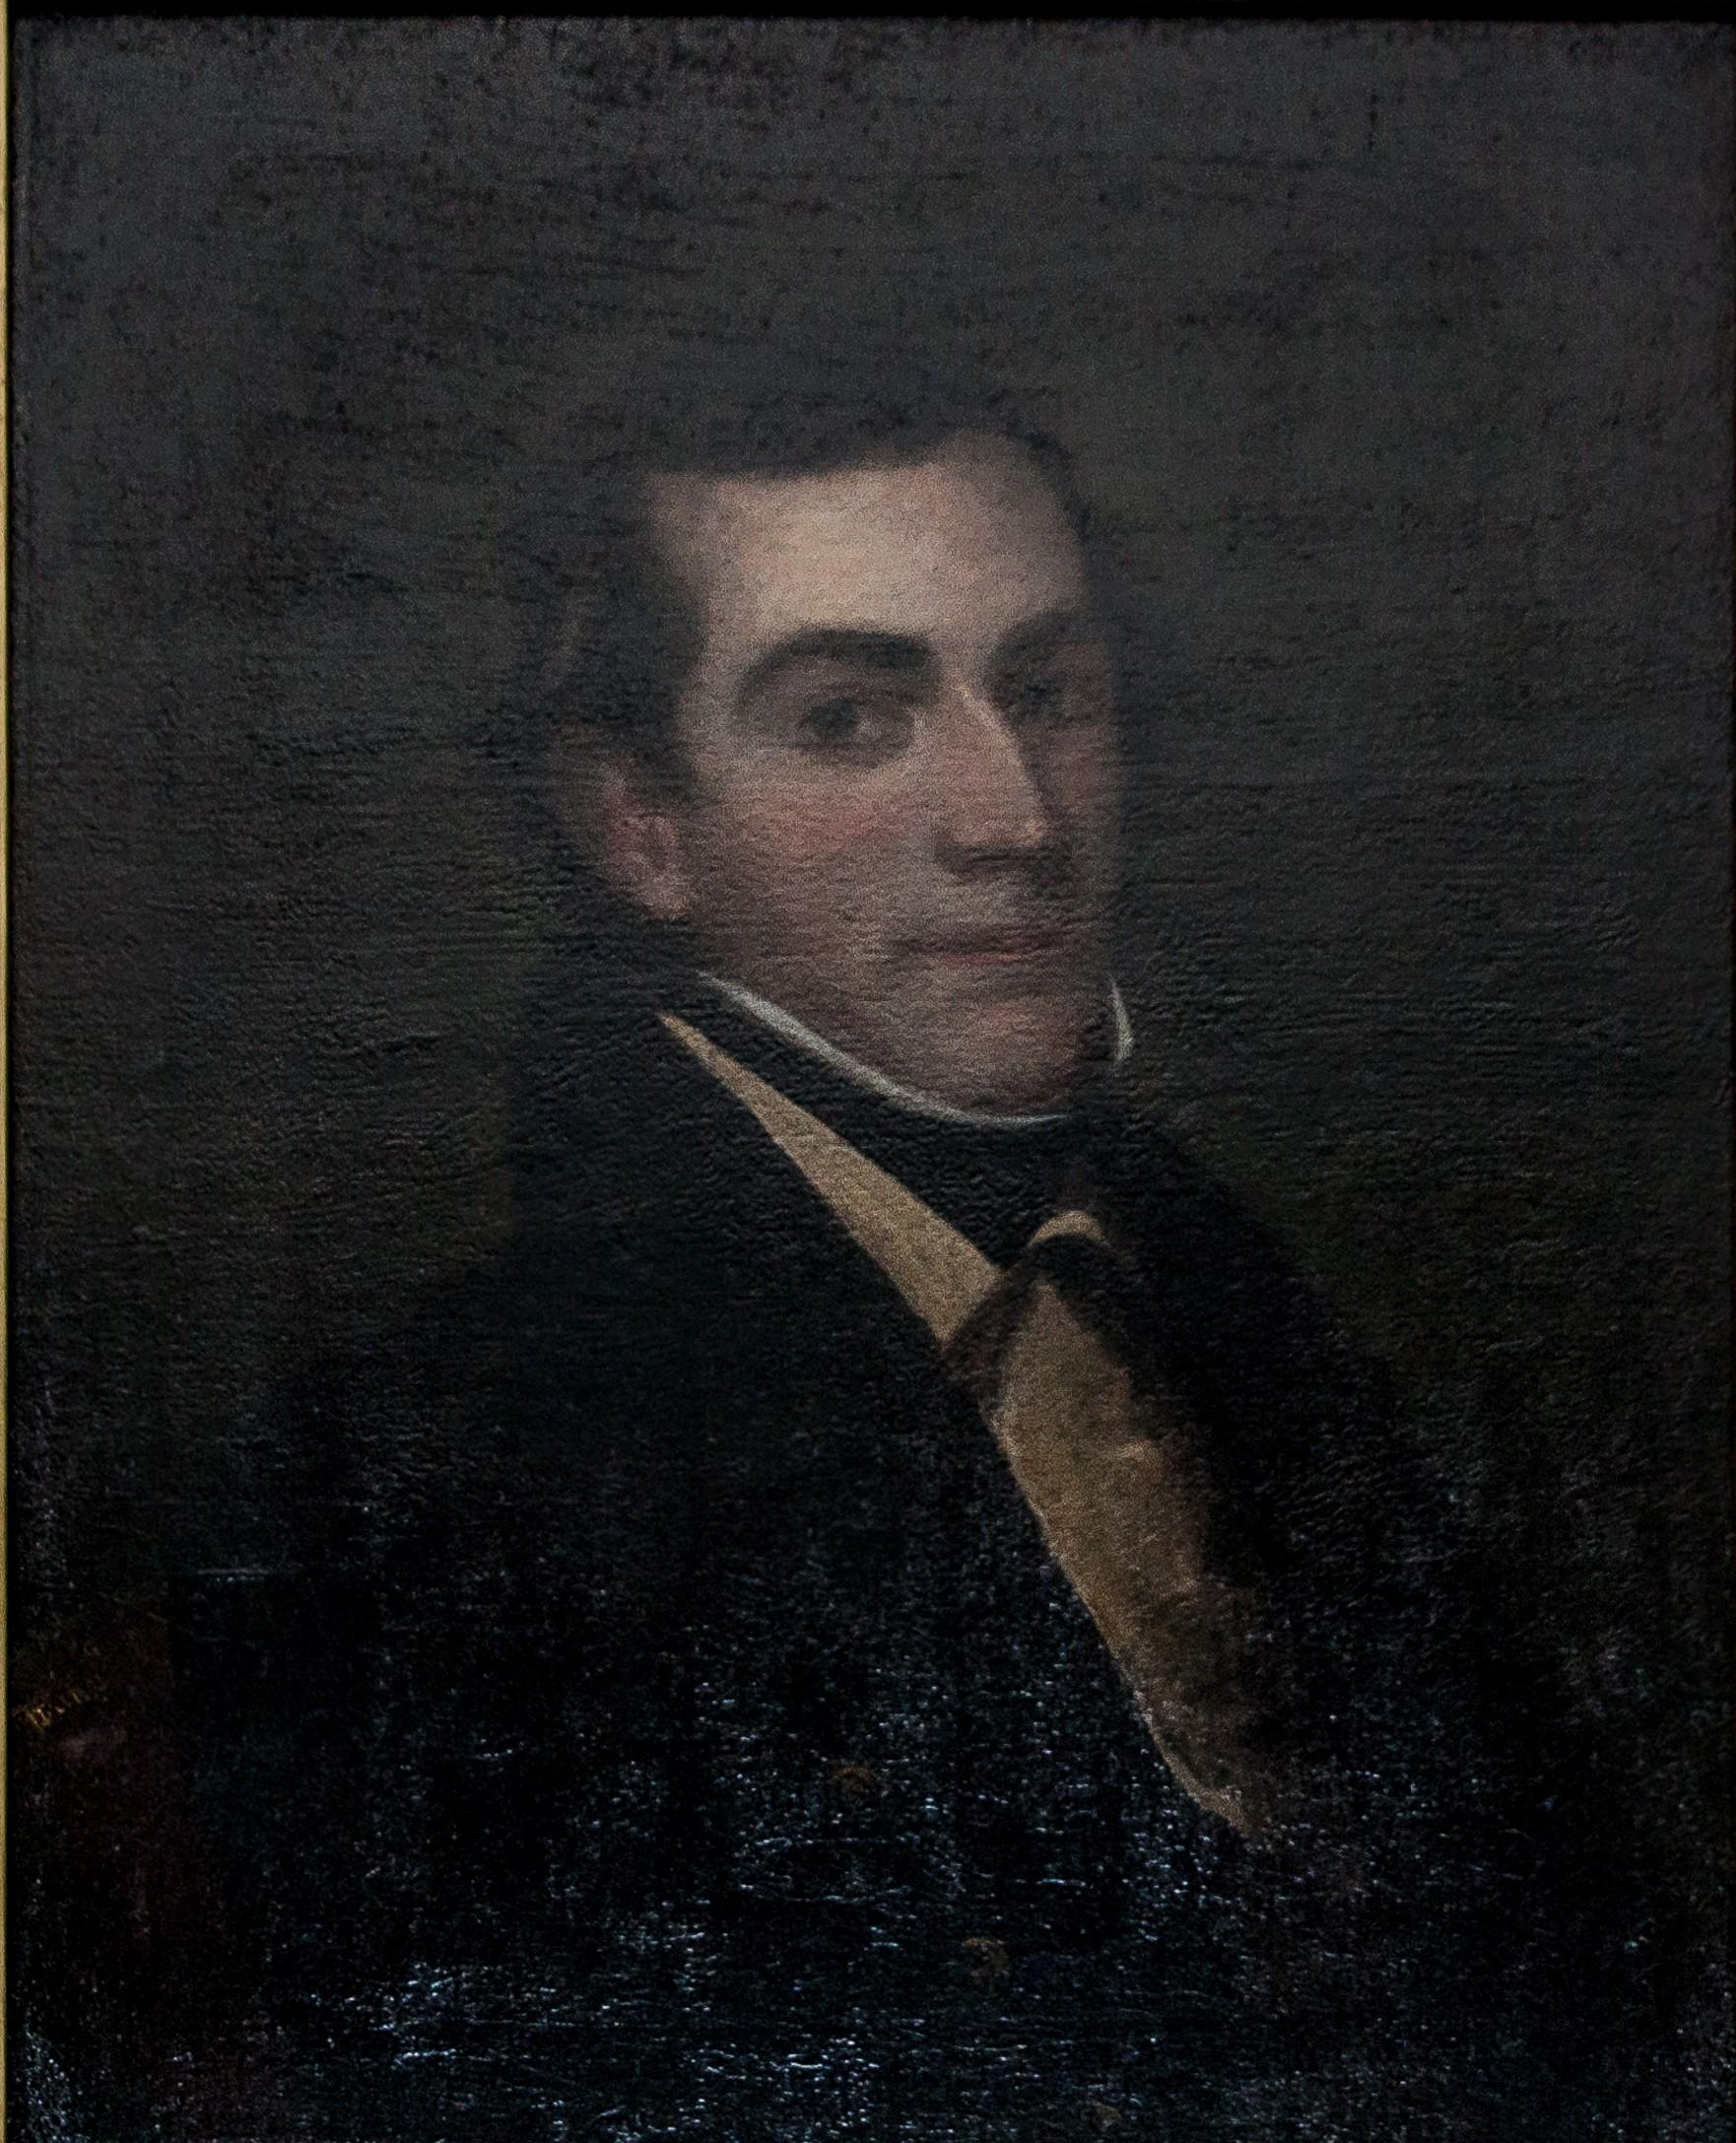 Judge Daniel